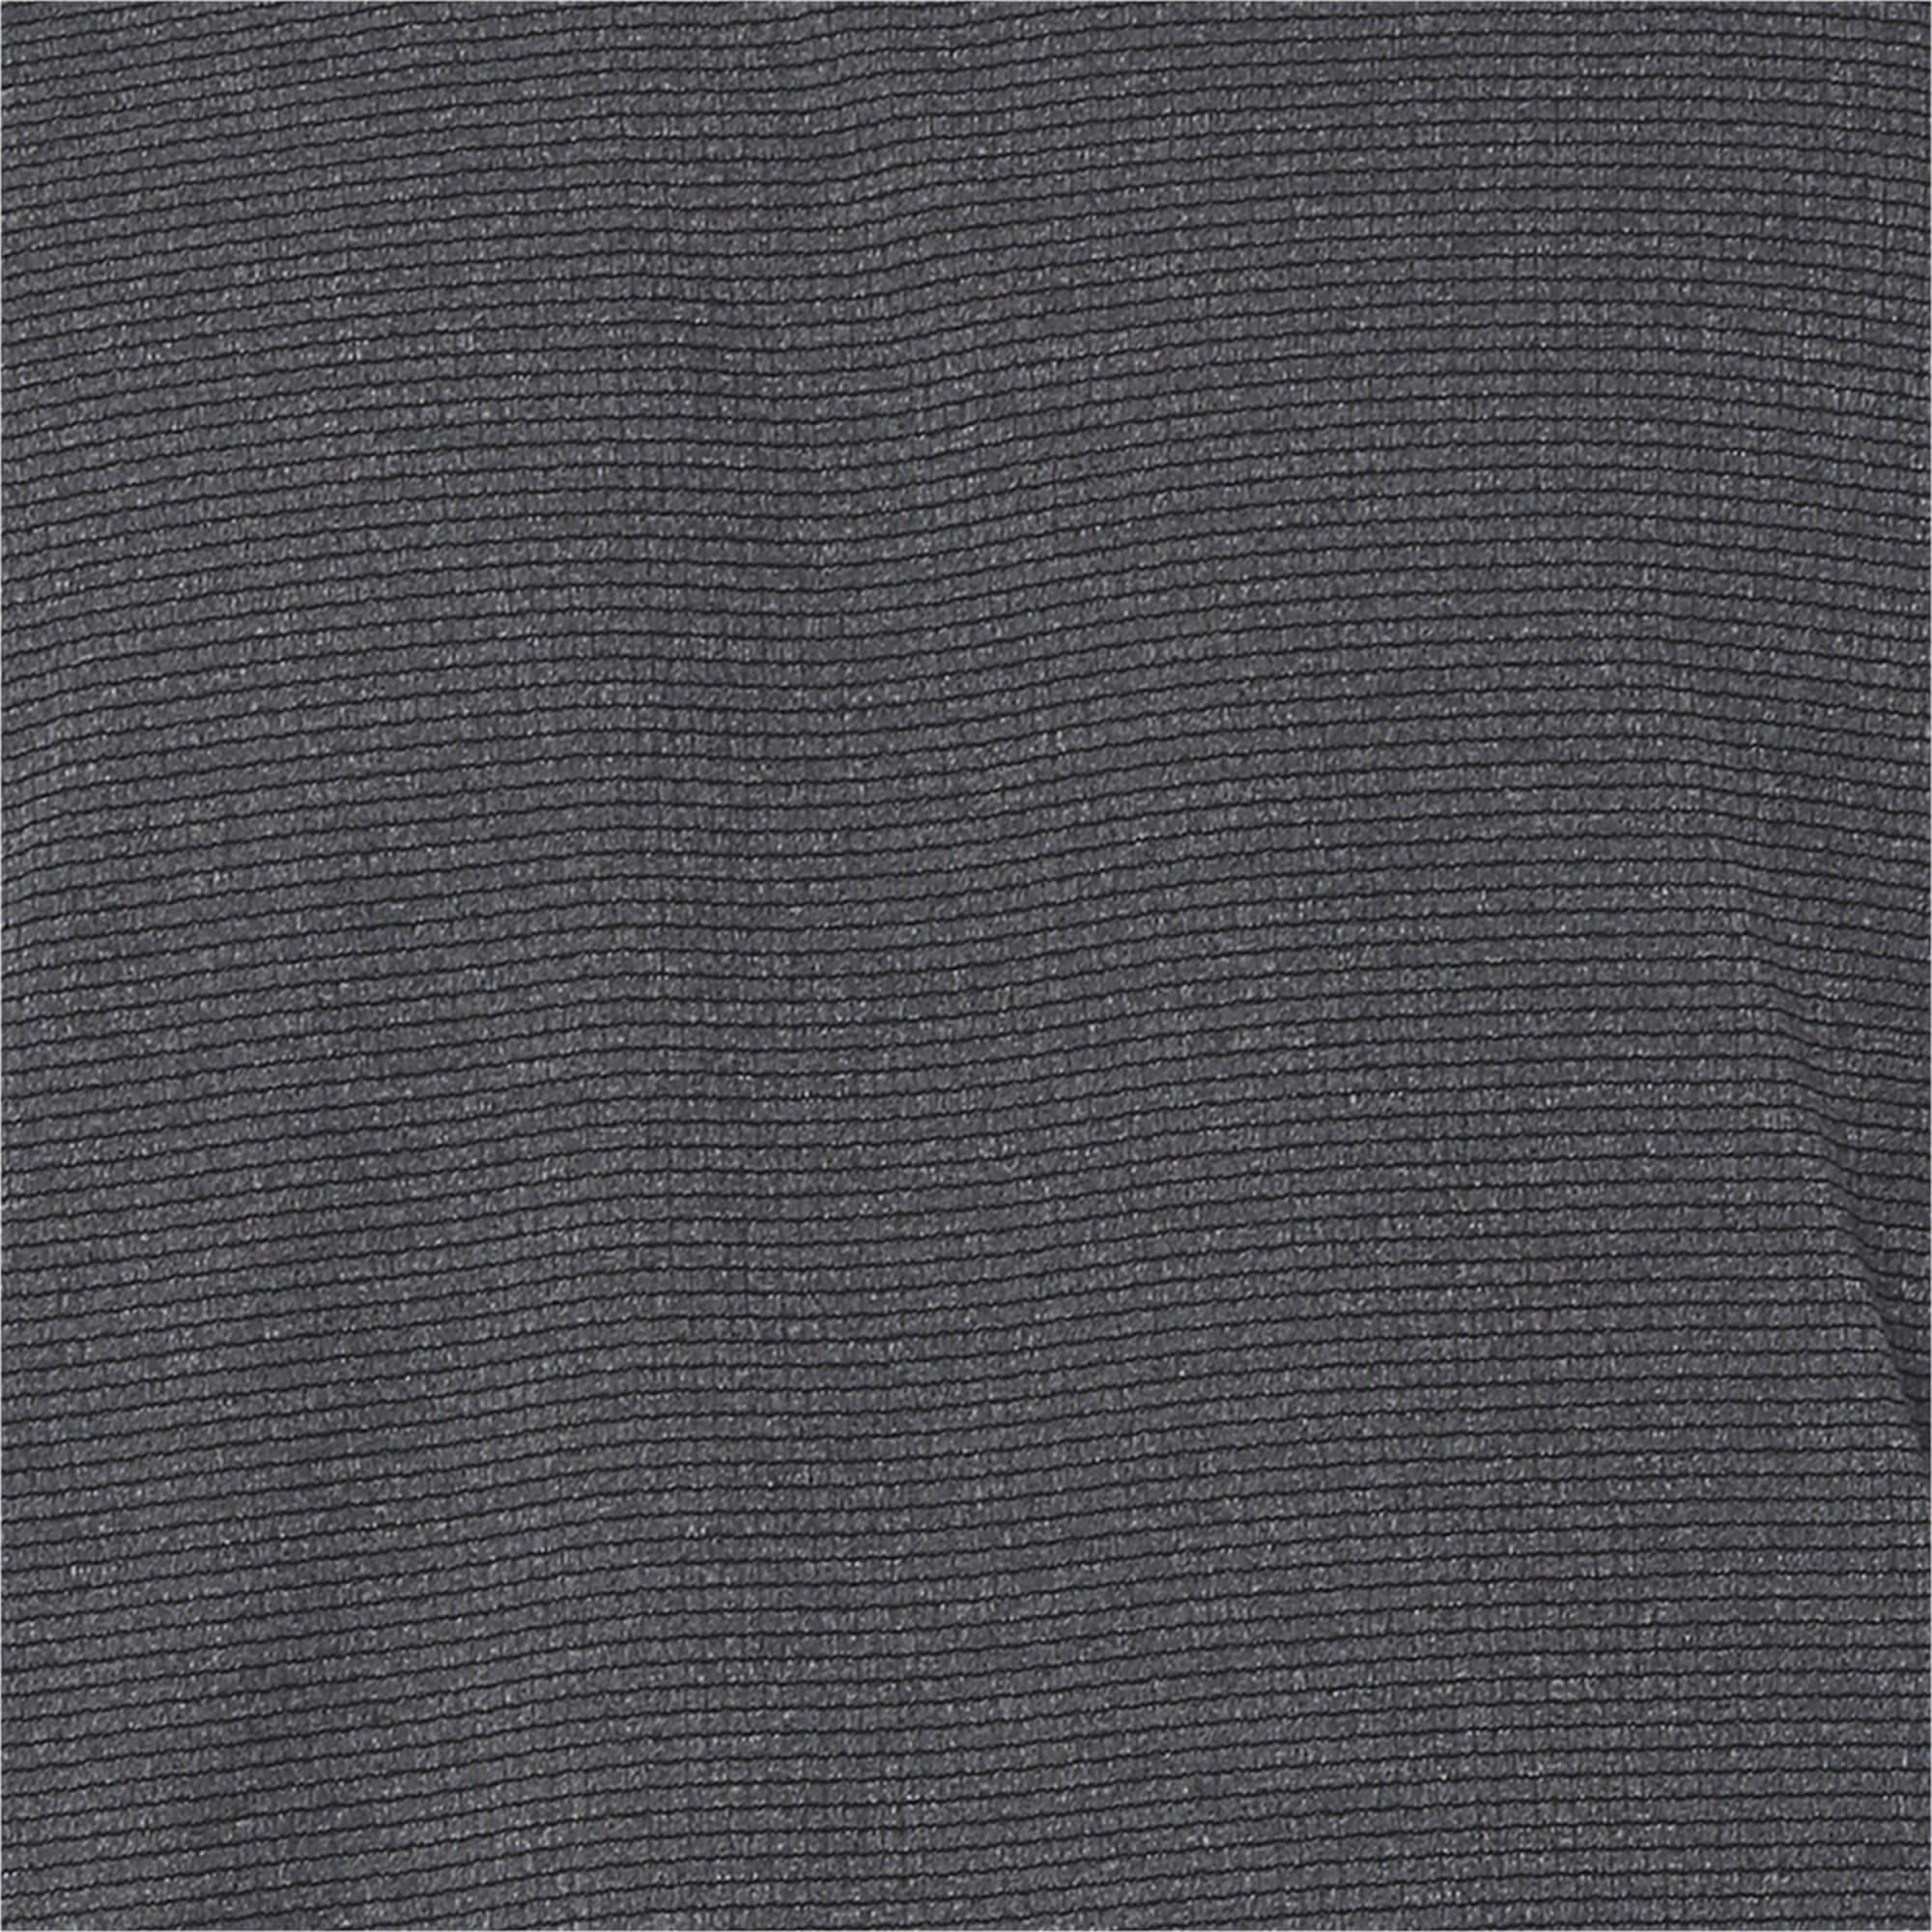 Thumbnail 6 of one8 VK Active Men's Singlet Tee, Dark Gray Heather, medium-IND